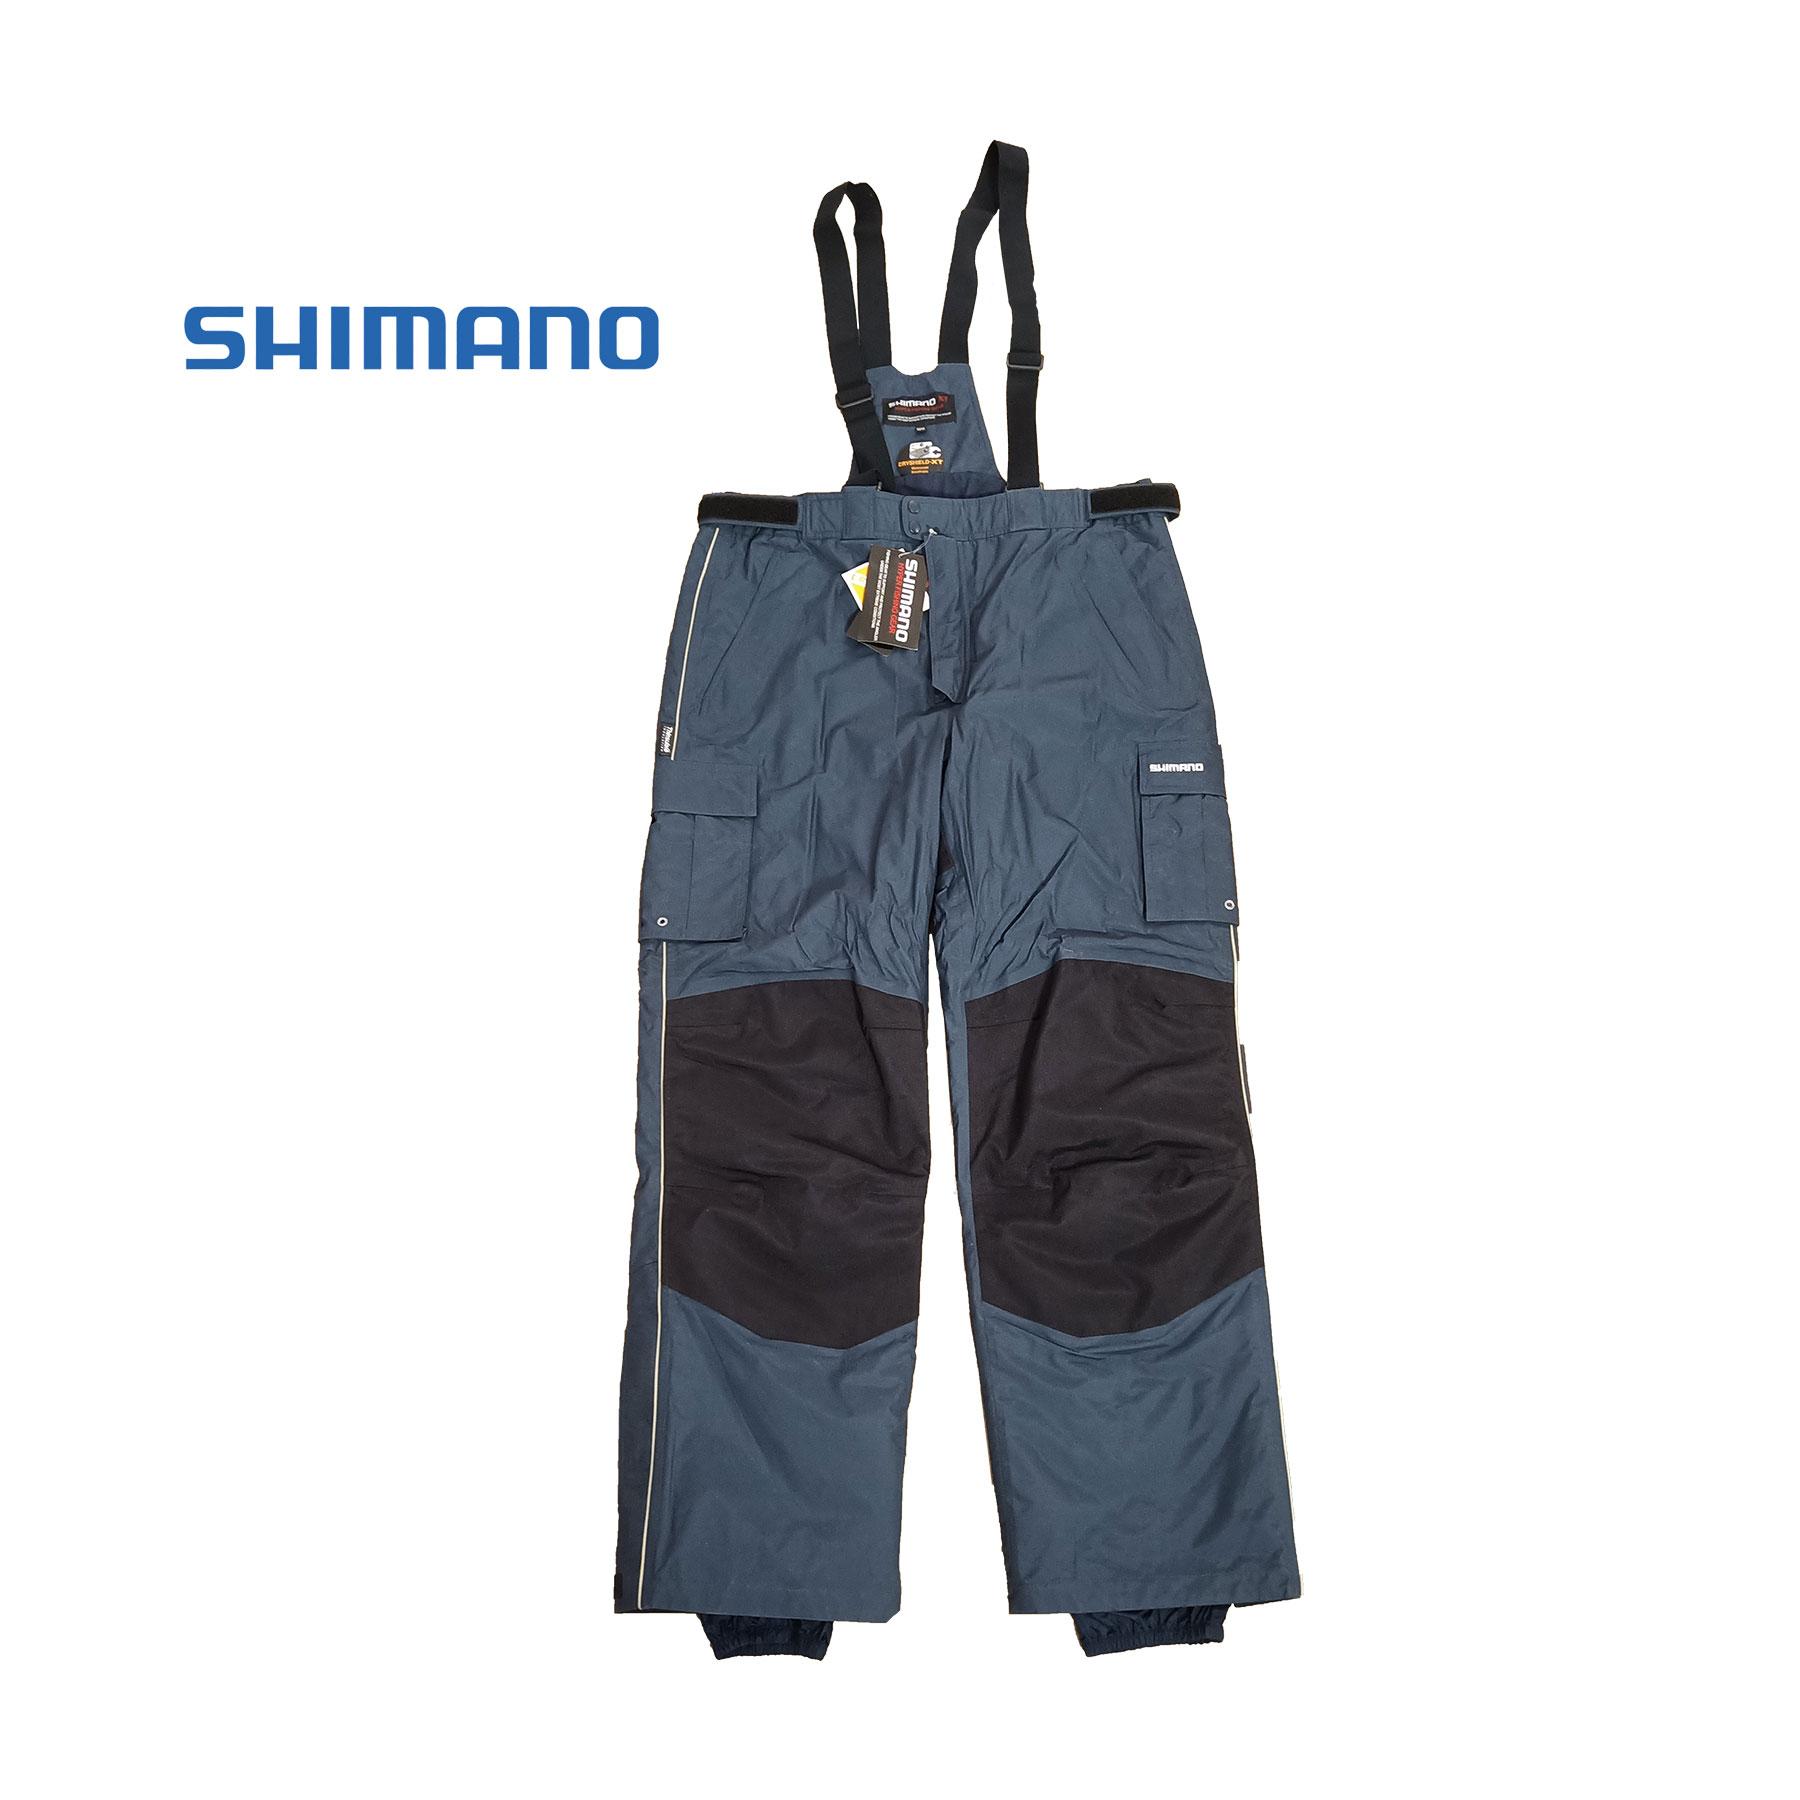 Shimano Thermo pants